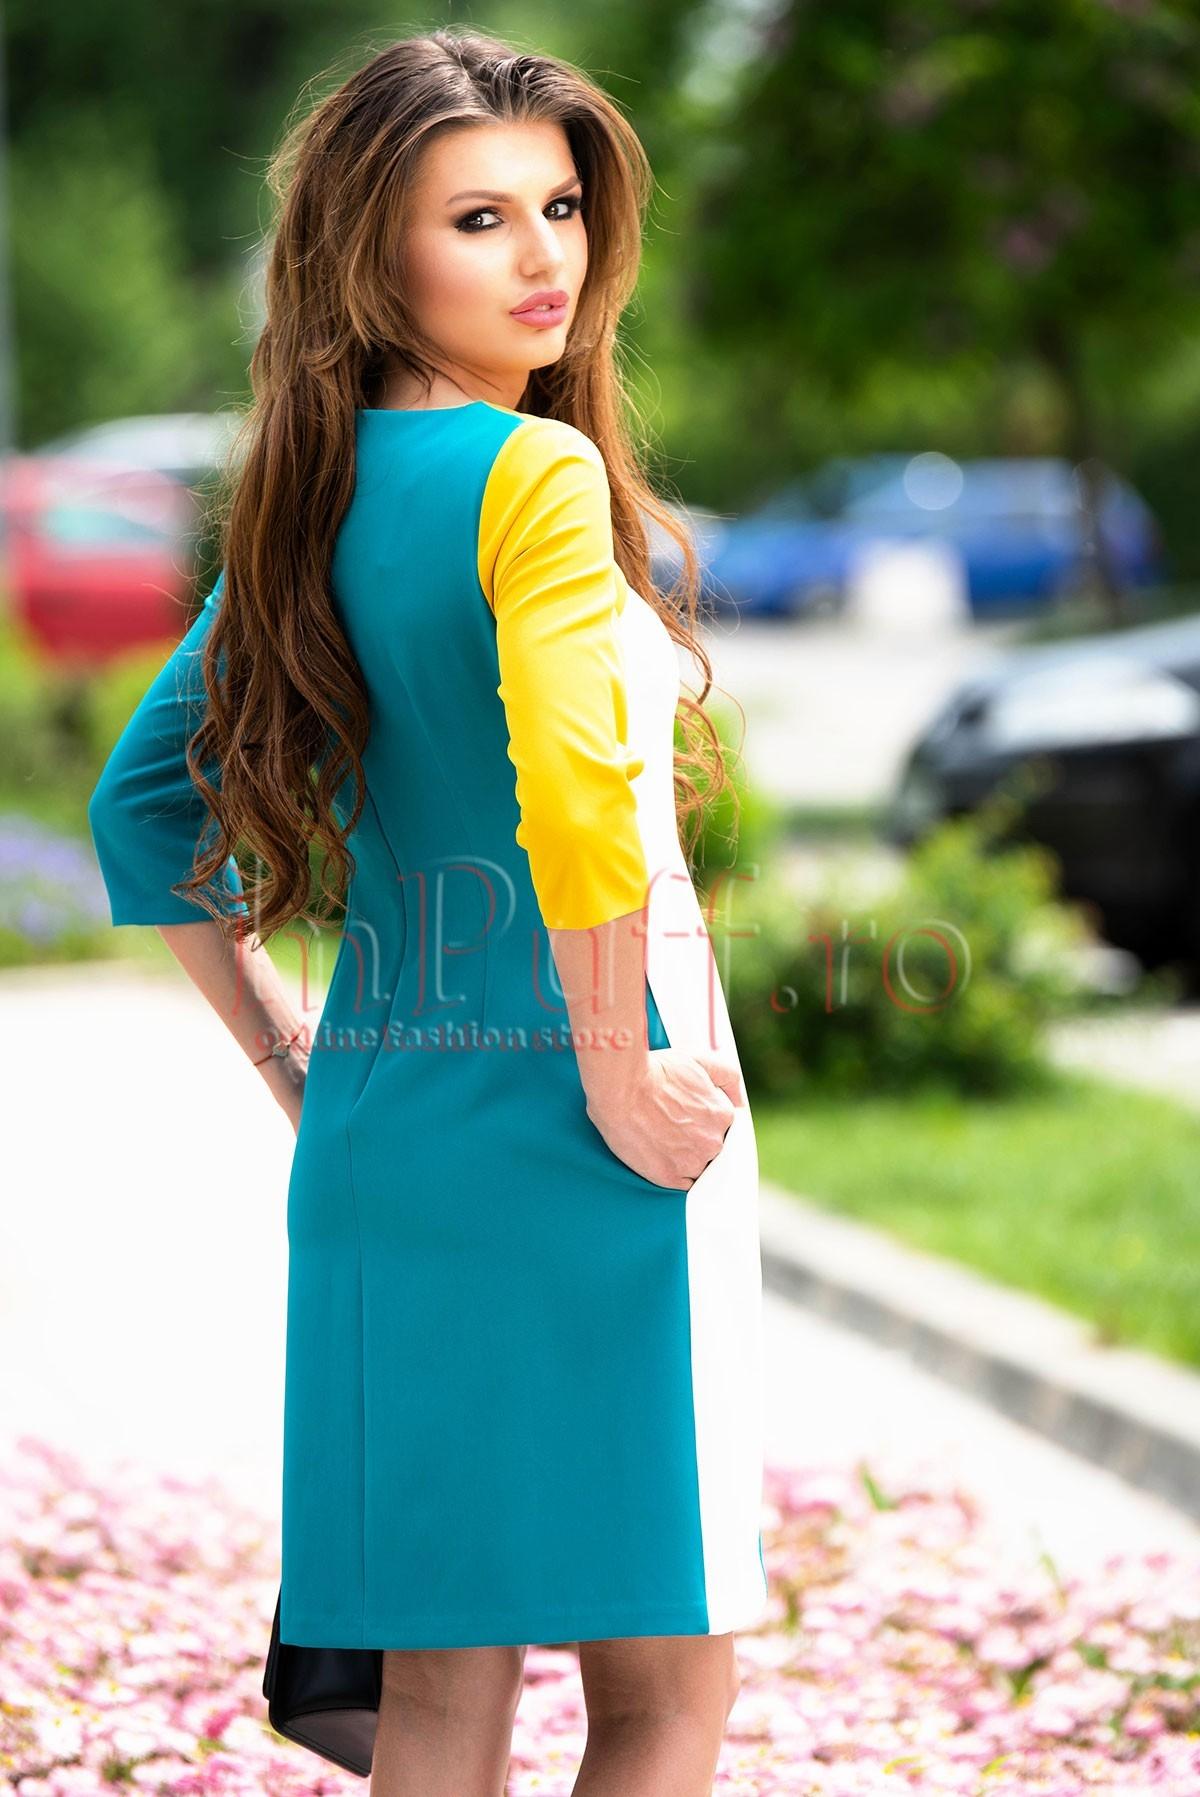 Rochie MBG turcoaz cu alb si galben